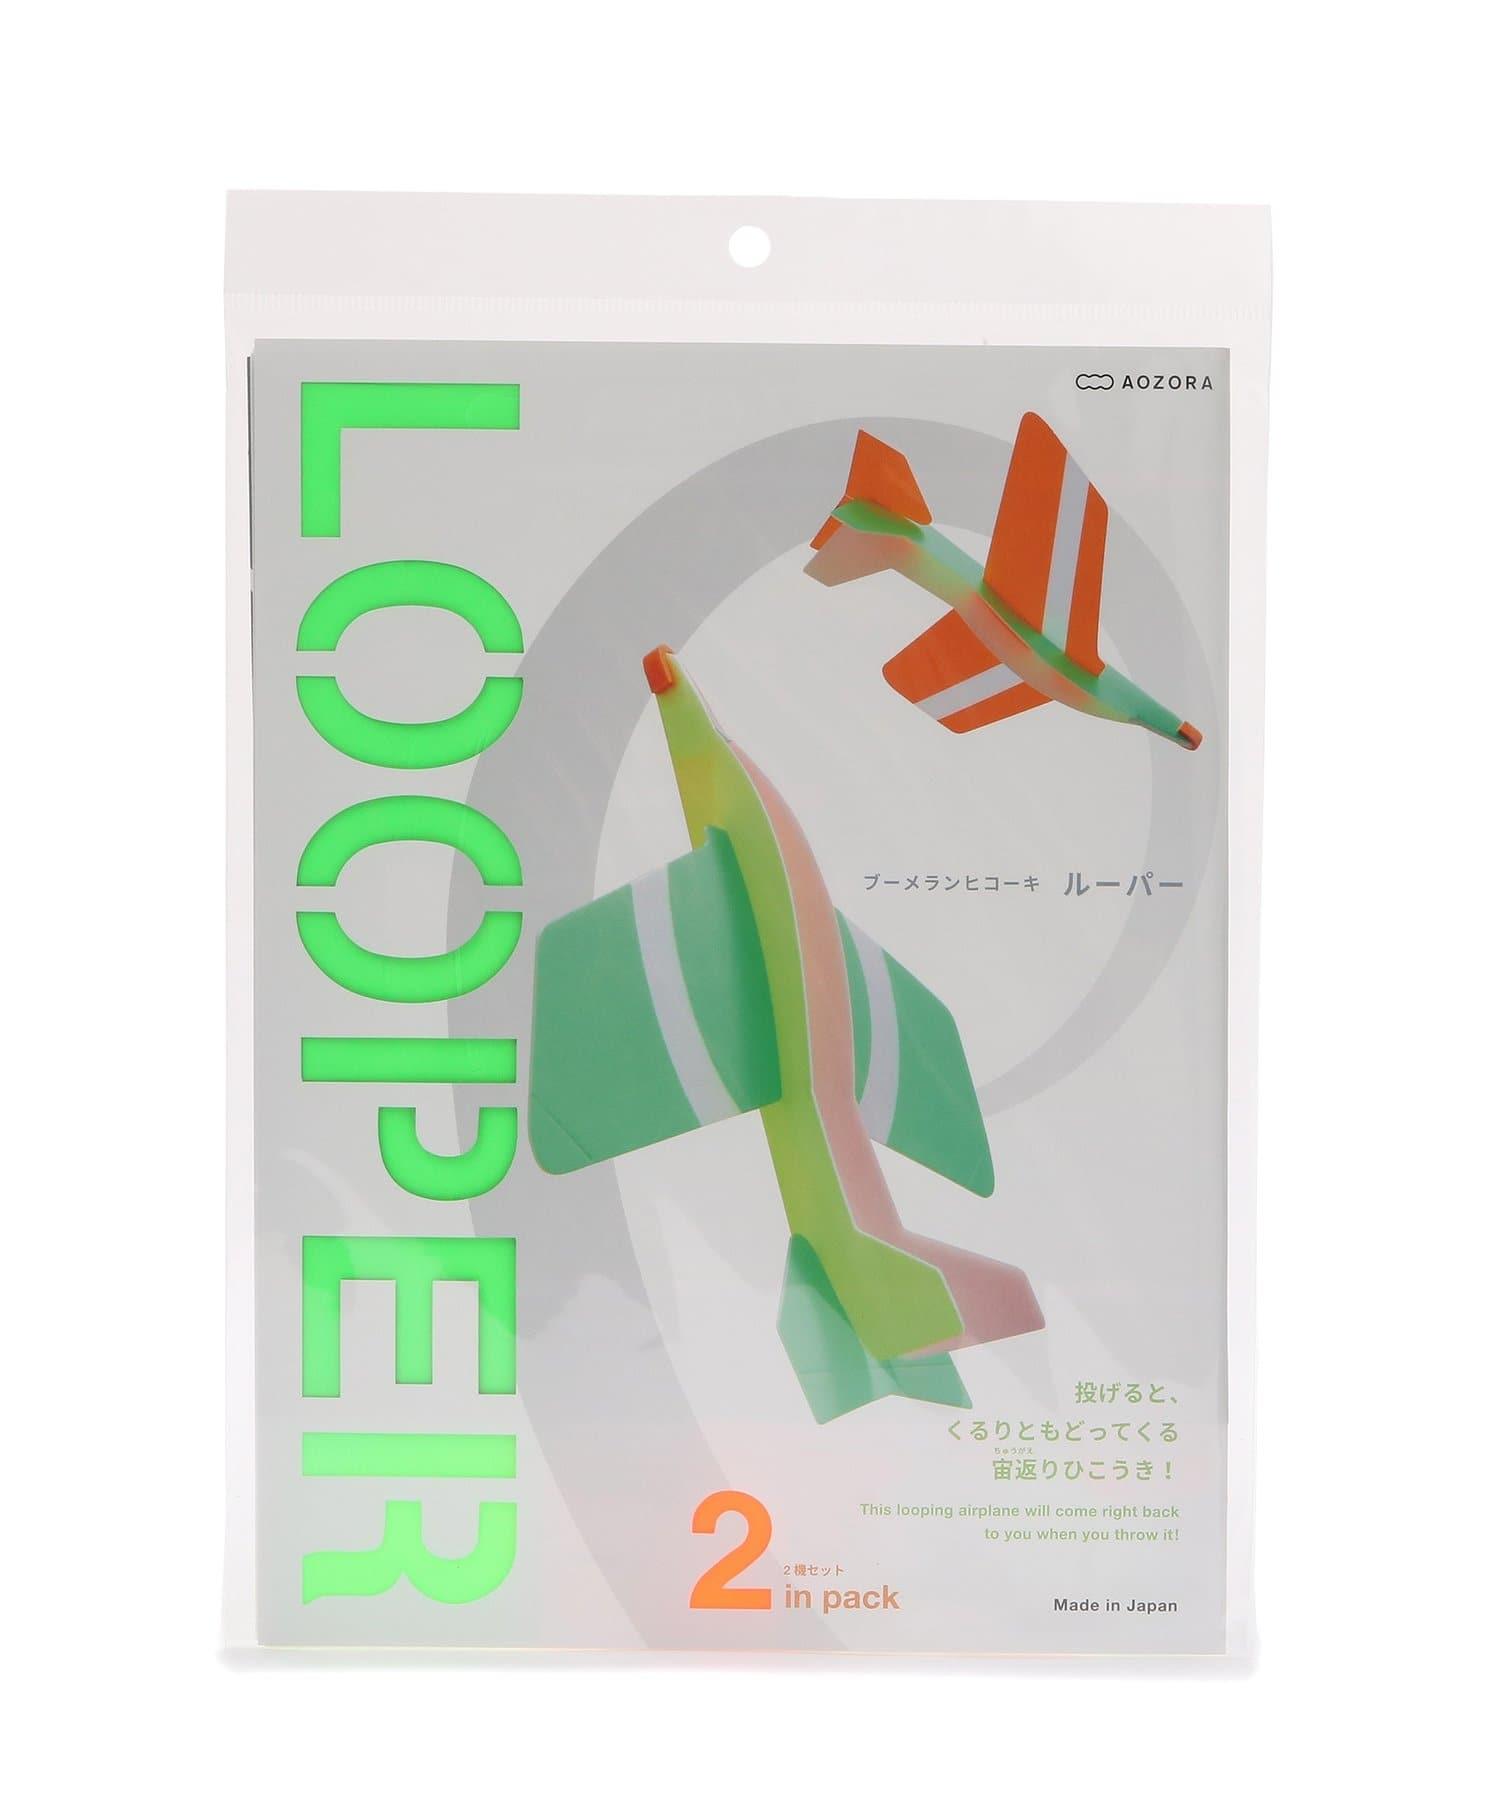 CIAOPANIC TYPY(チャオパニックティピー) ライフスタイル 【アオゾラ】ブーメラン飛行機 ルーパー2機入り カラーなし